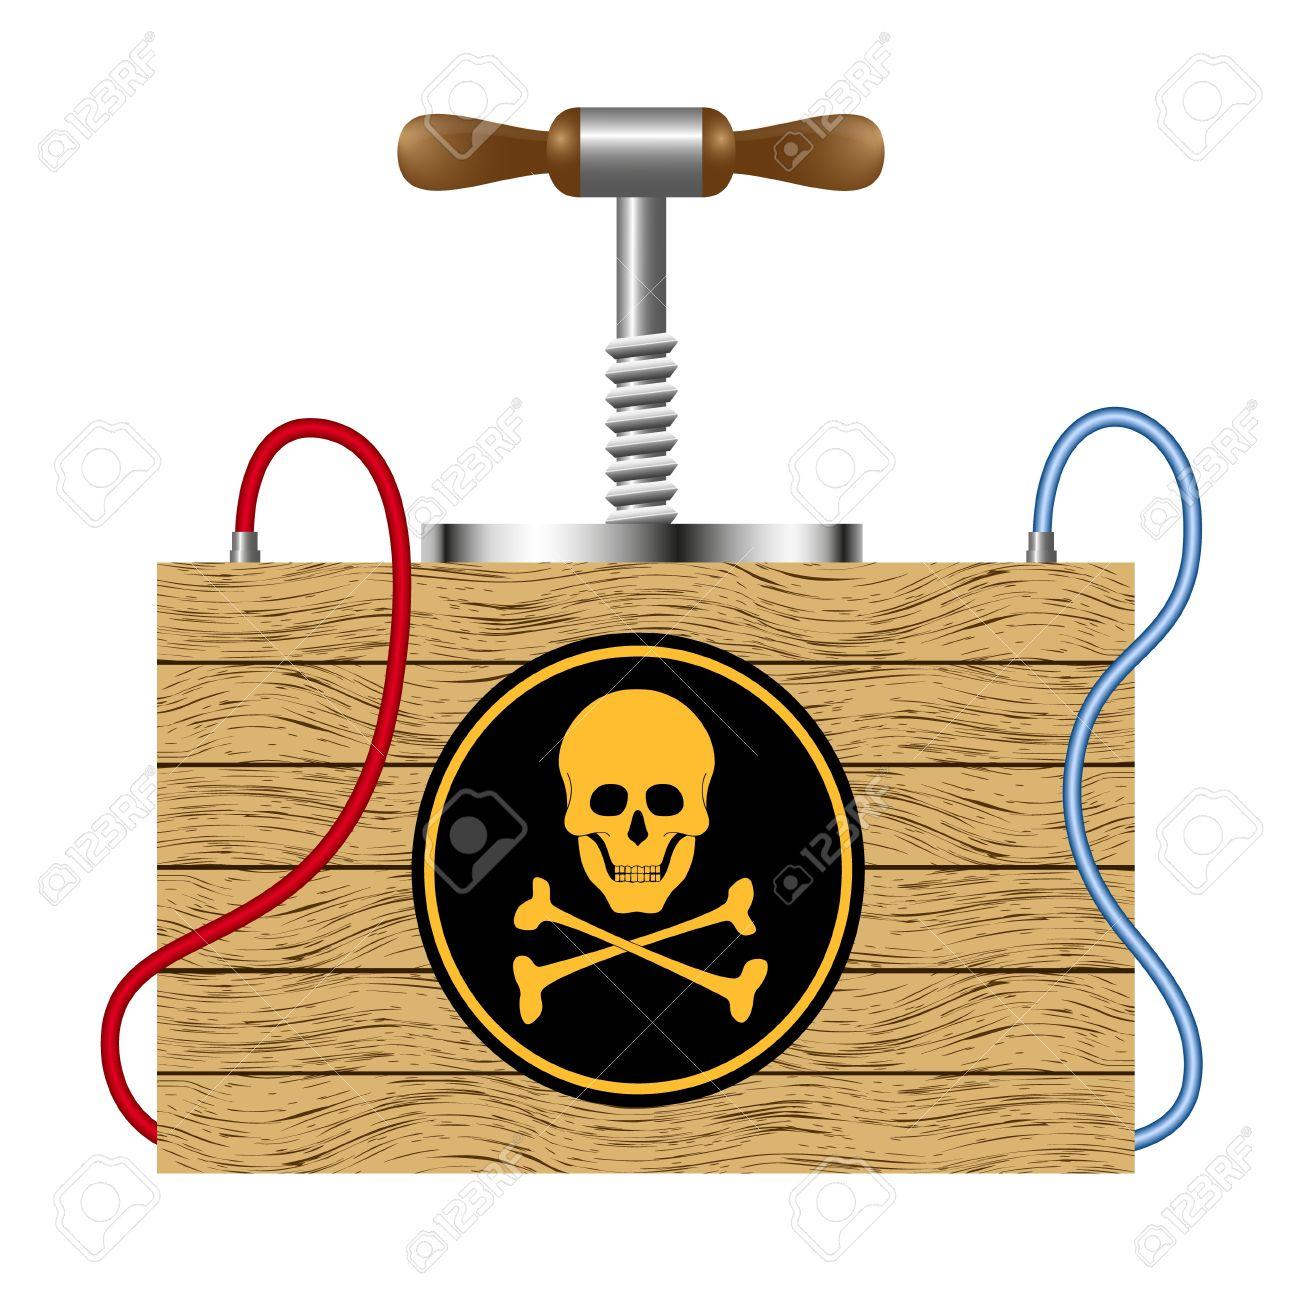 Dombs Garderobekast Wit.Bomb Detonation Cabinet With Danger Sign Skull Symbol Royalty